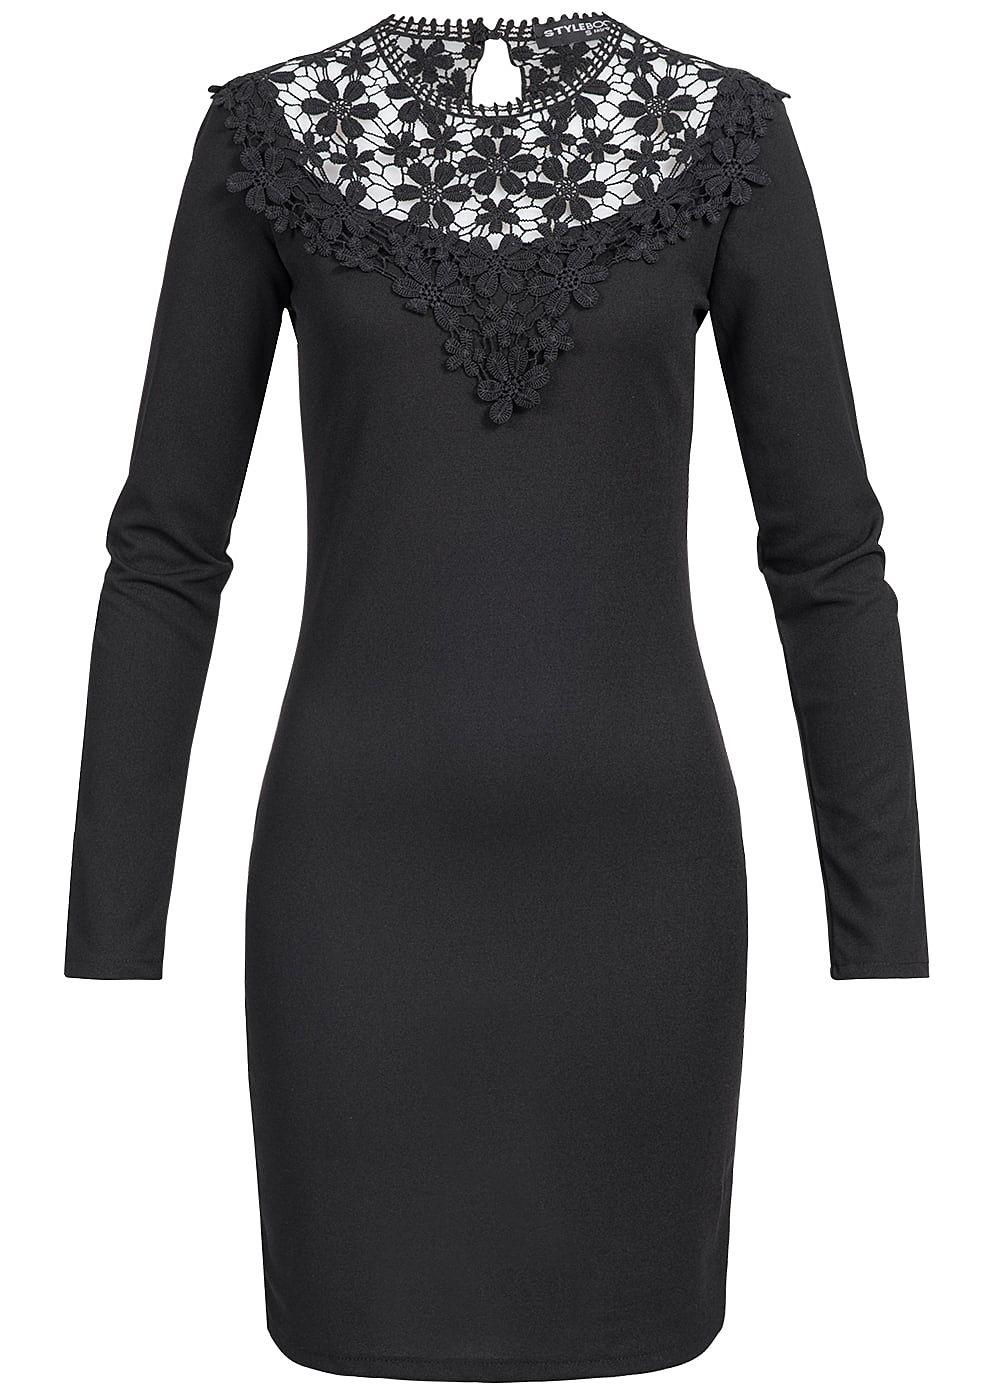 styleboom fashion damen mini kleid langarm spitze schwarz. Black Bedroom Furniture Sets. Home Design Ideas